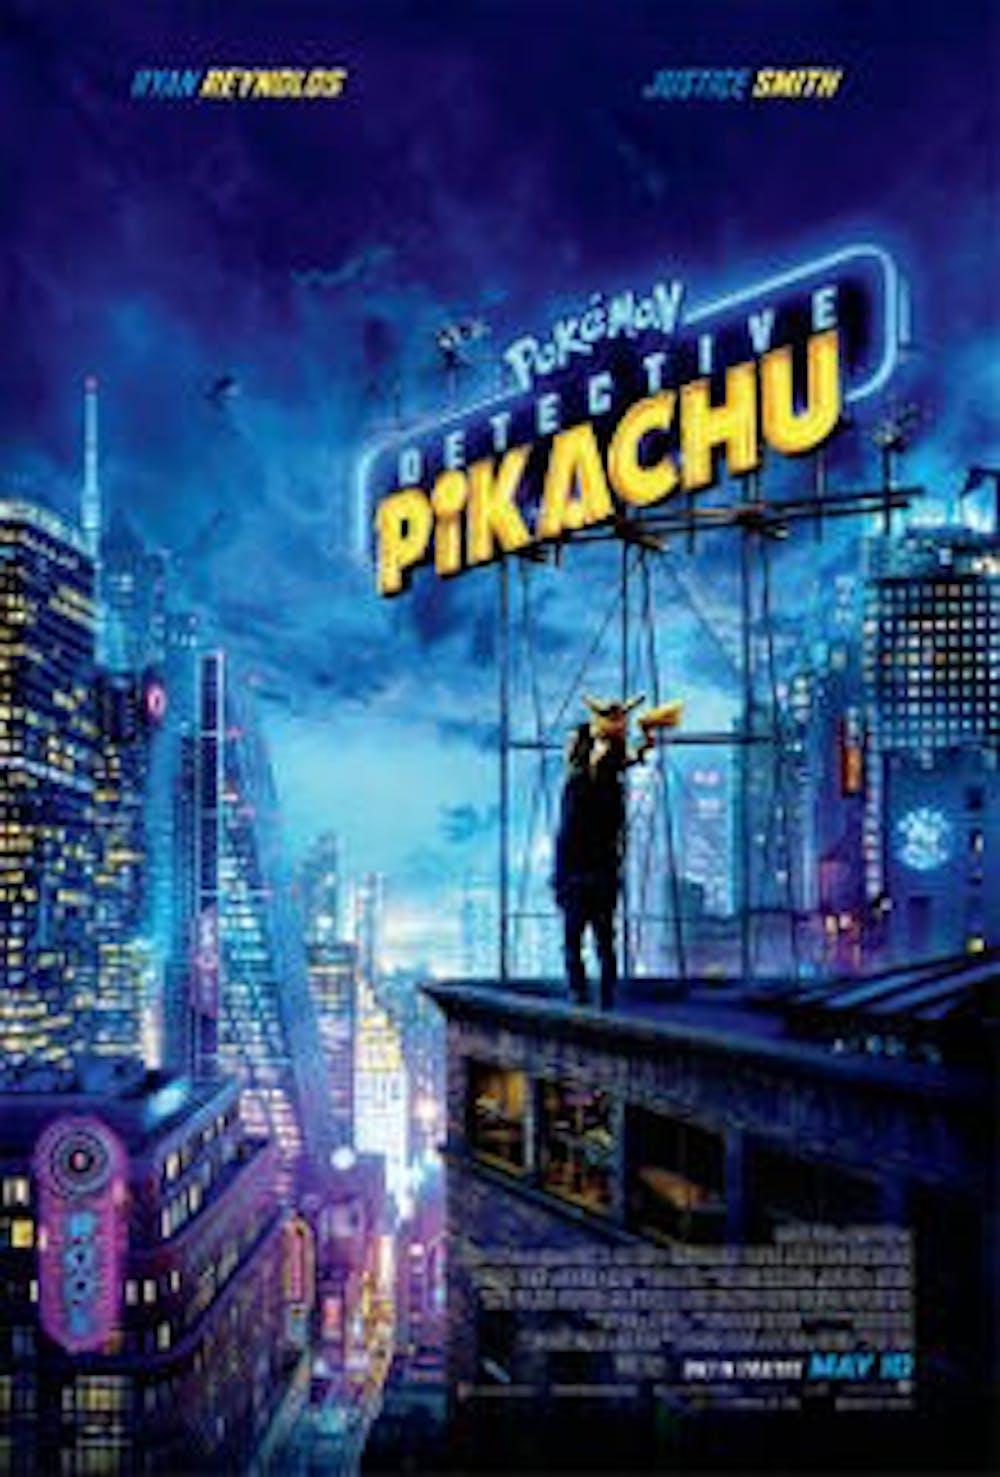 pokemon-detective-pikachu-teaser-poster